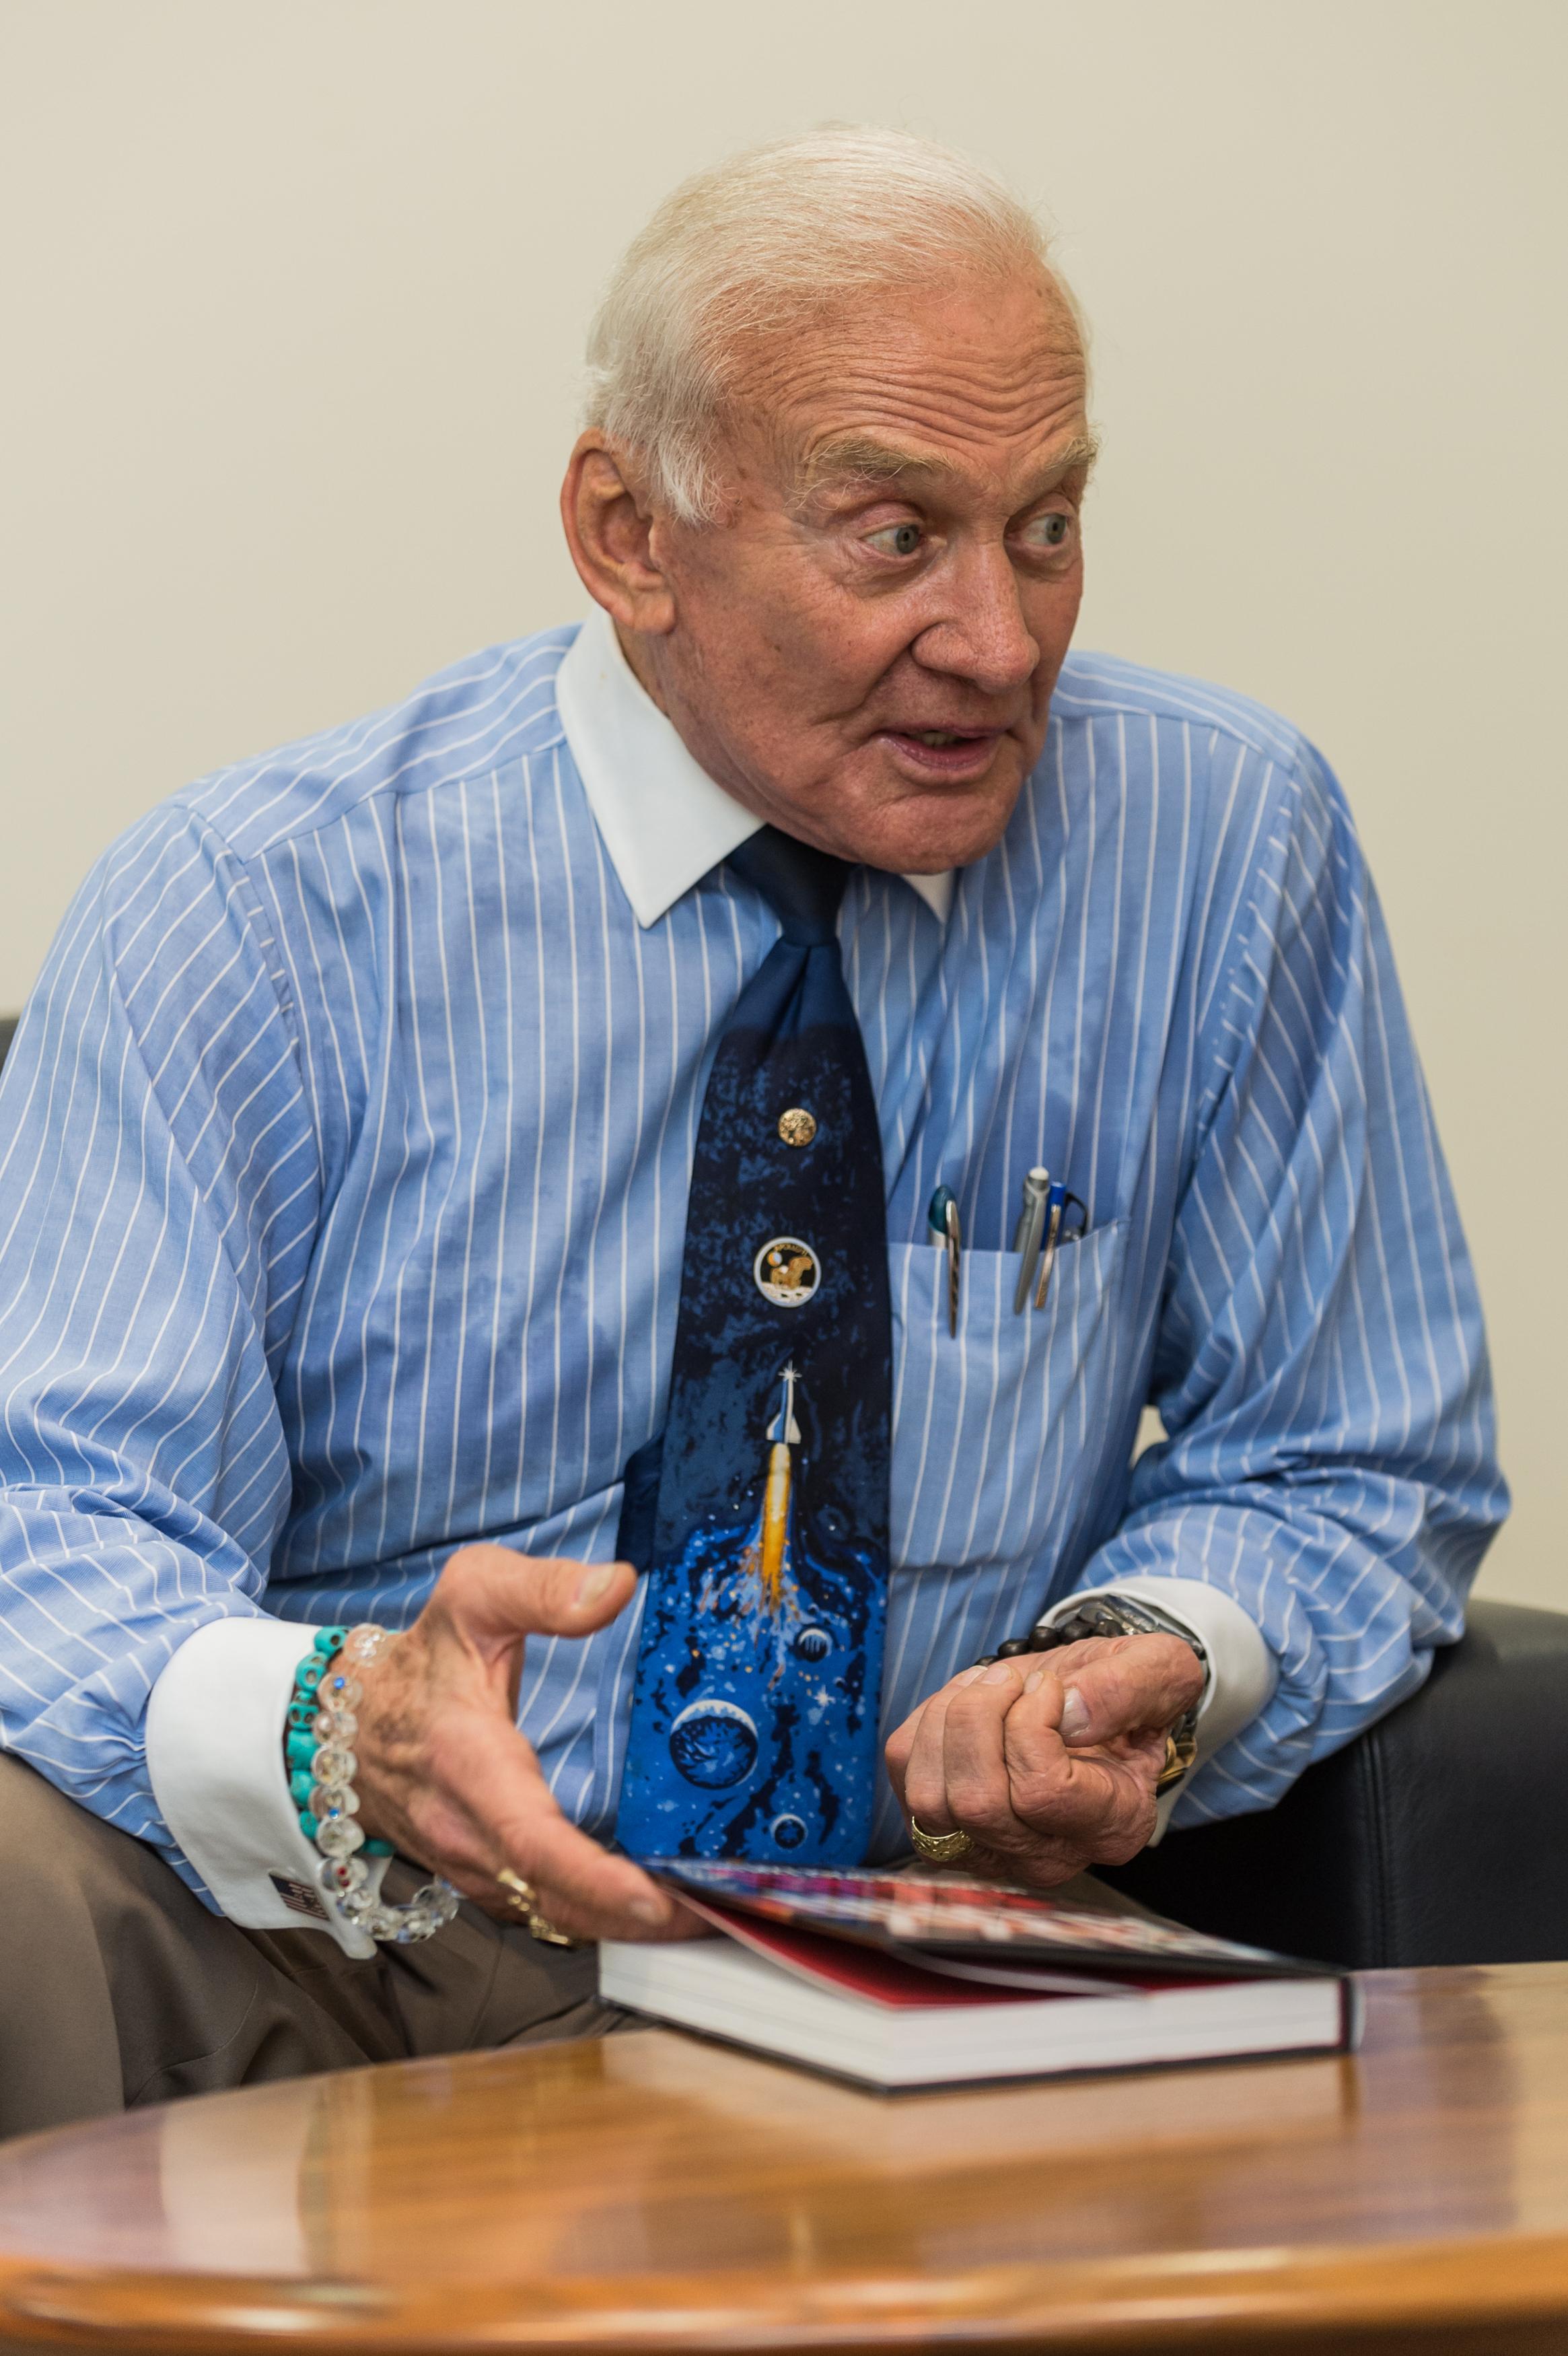 Buzz-Aldrin-HiRes-2829.jpg